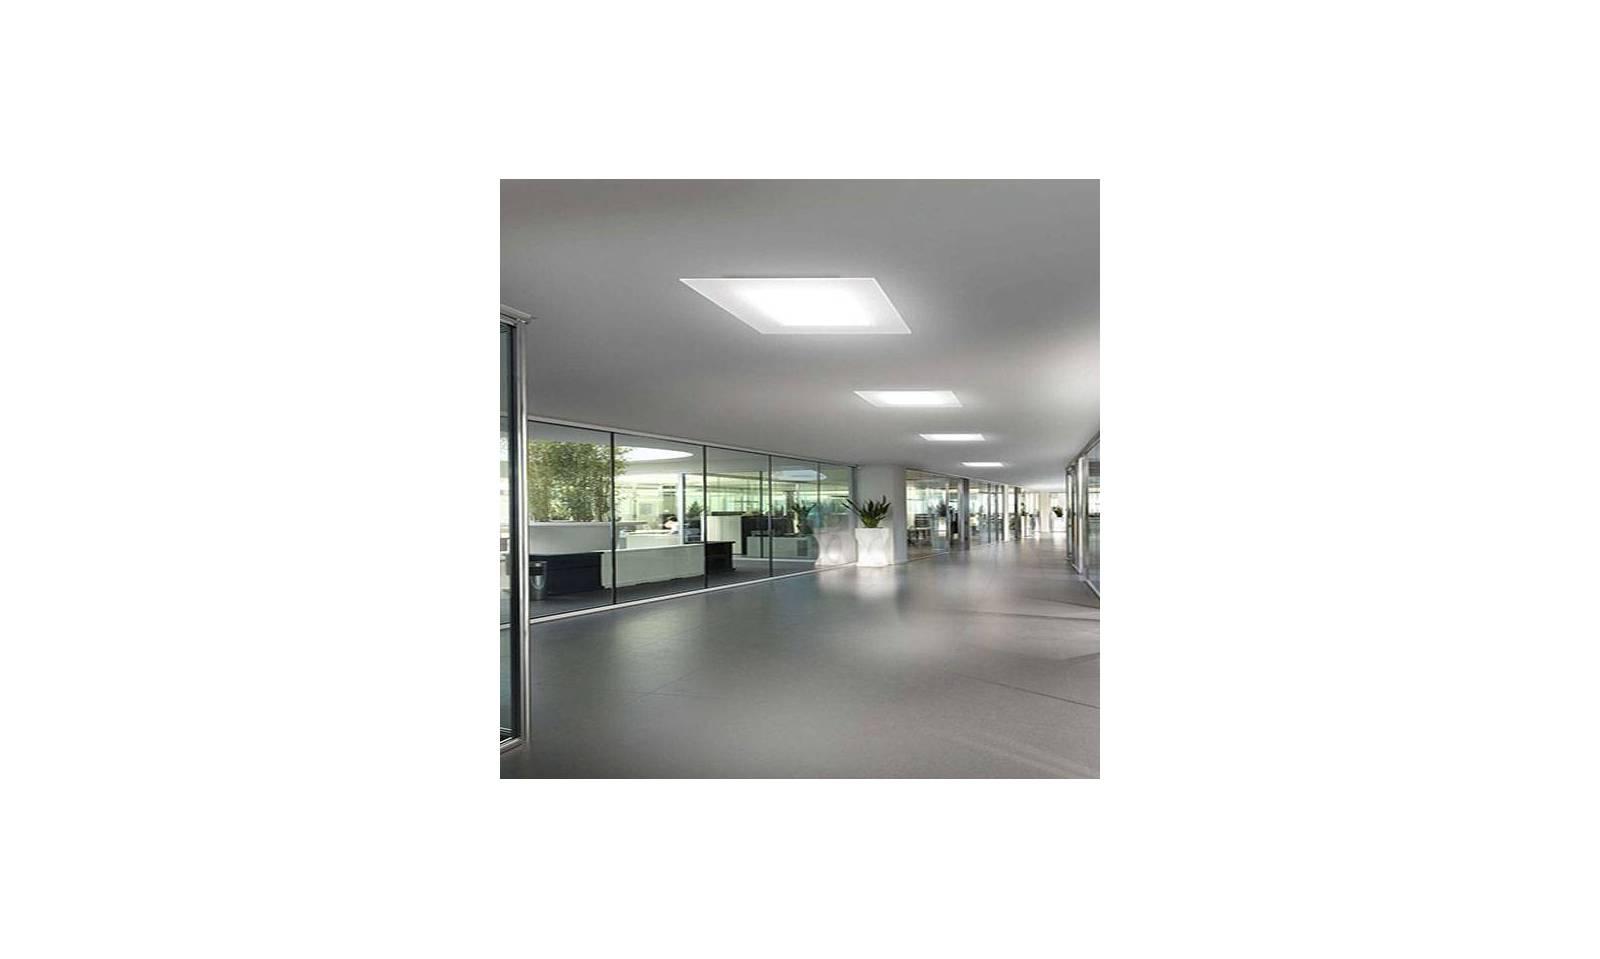 Plafoniera Quadrata Led Soffitto : Linea light modern ceiling lamp dublight quadrata led